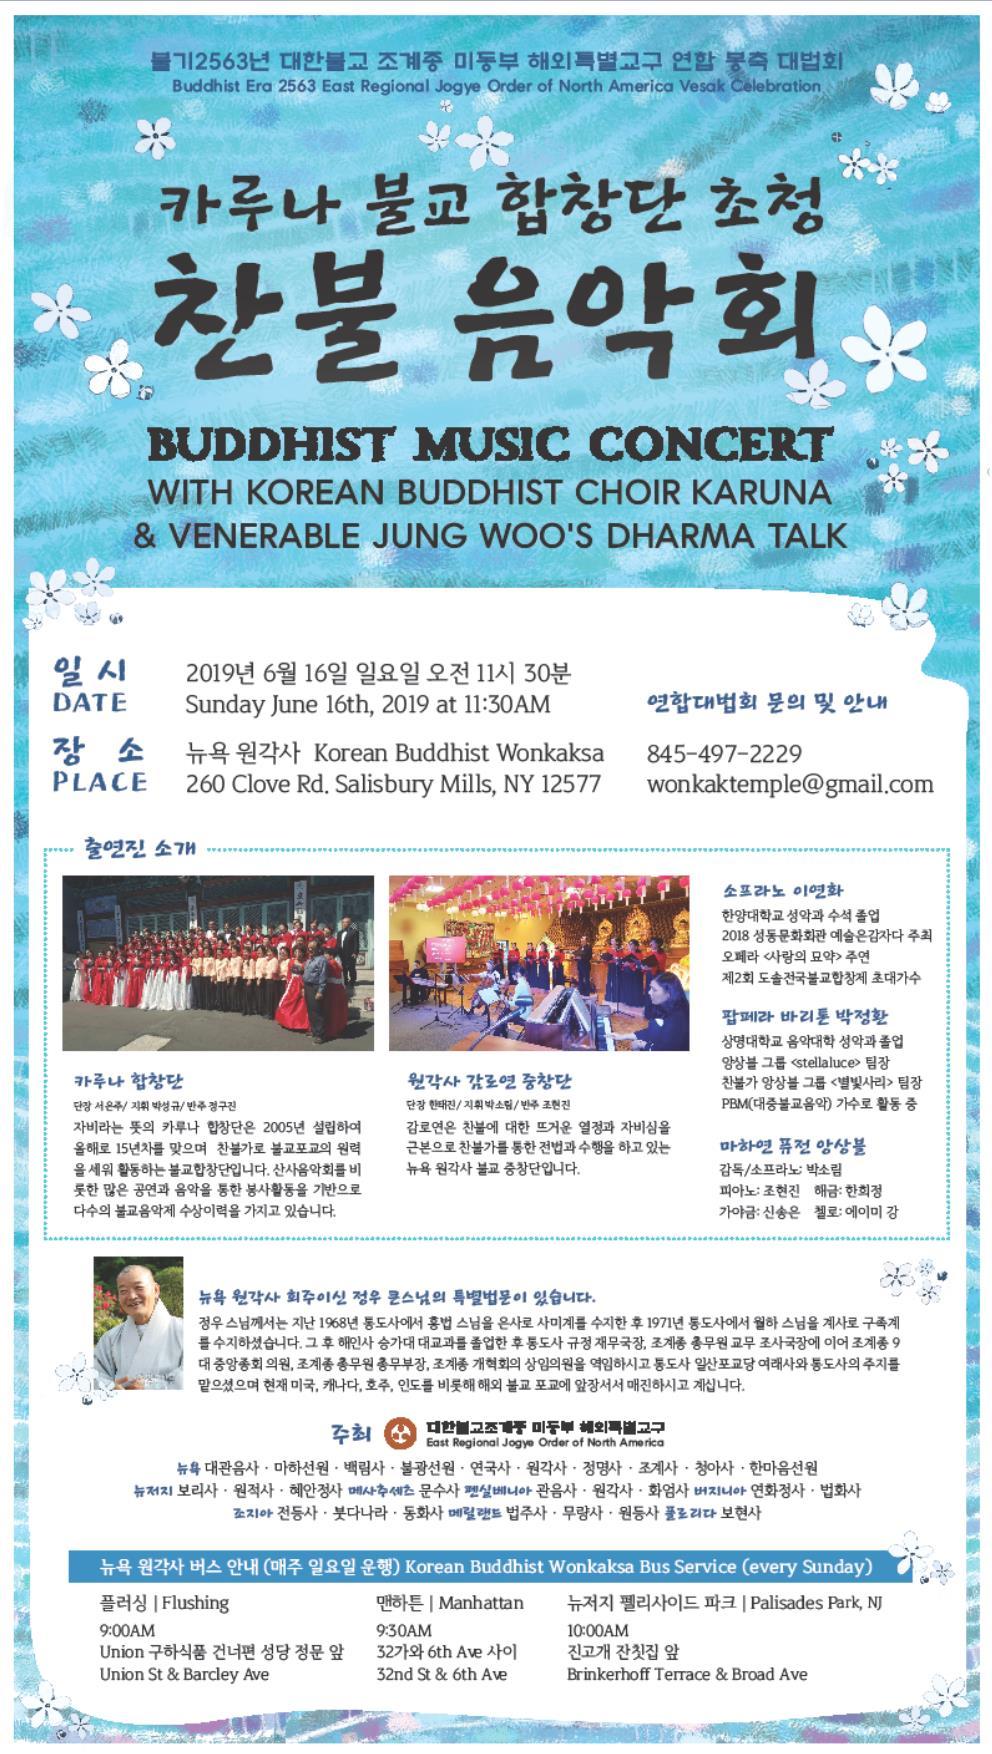 Buddhist Music Concert with Korean Buddhist Choir Karuna  -